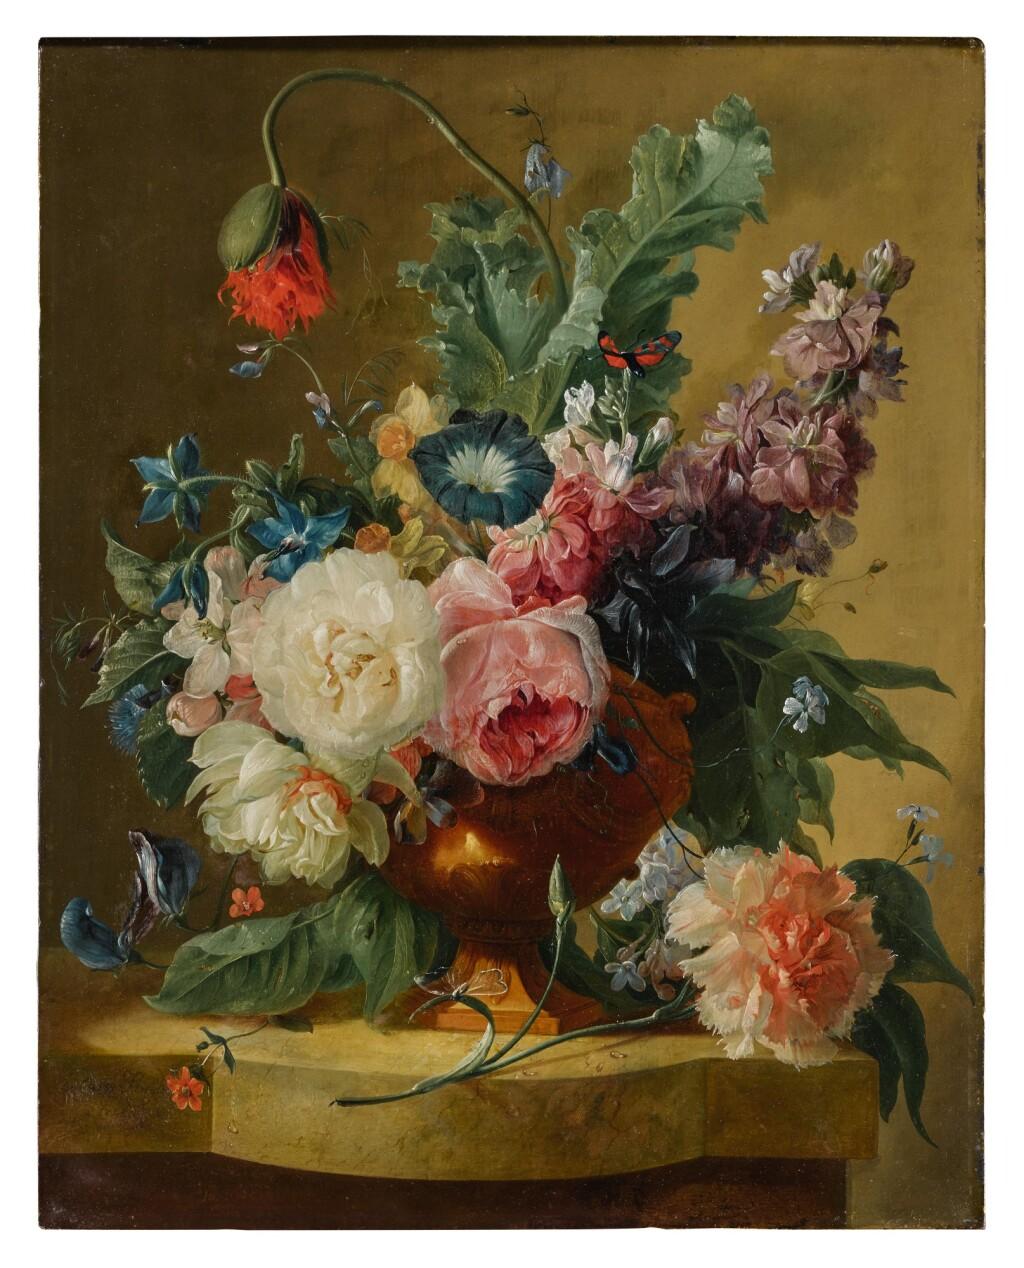 DUTCH SCHOOL, CIRCA 1750-1800   STILL LIFE OF FLOWERS IN A TERRACOTTA VASE ON A MARBLE LEDGE